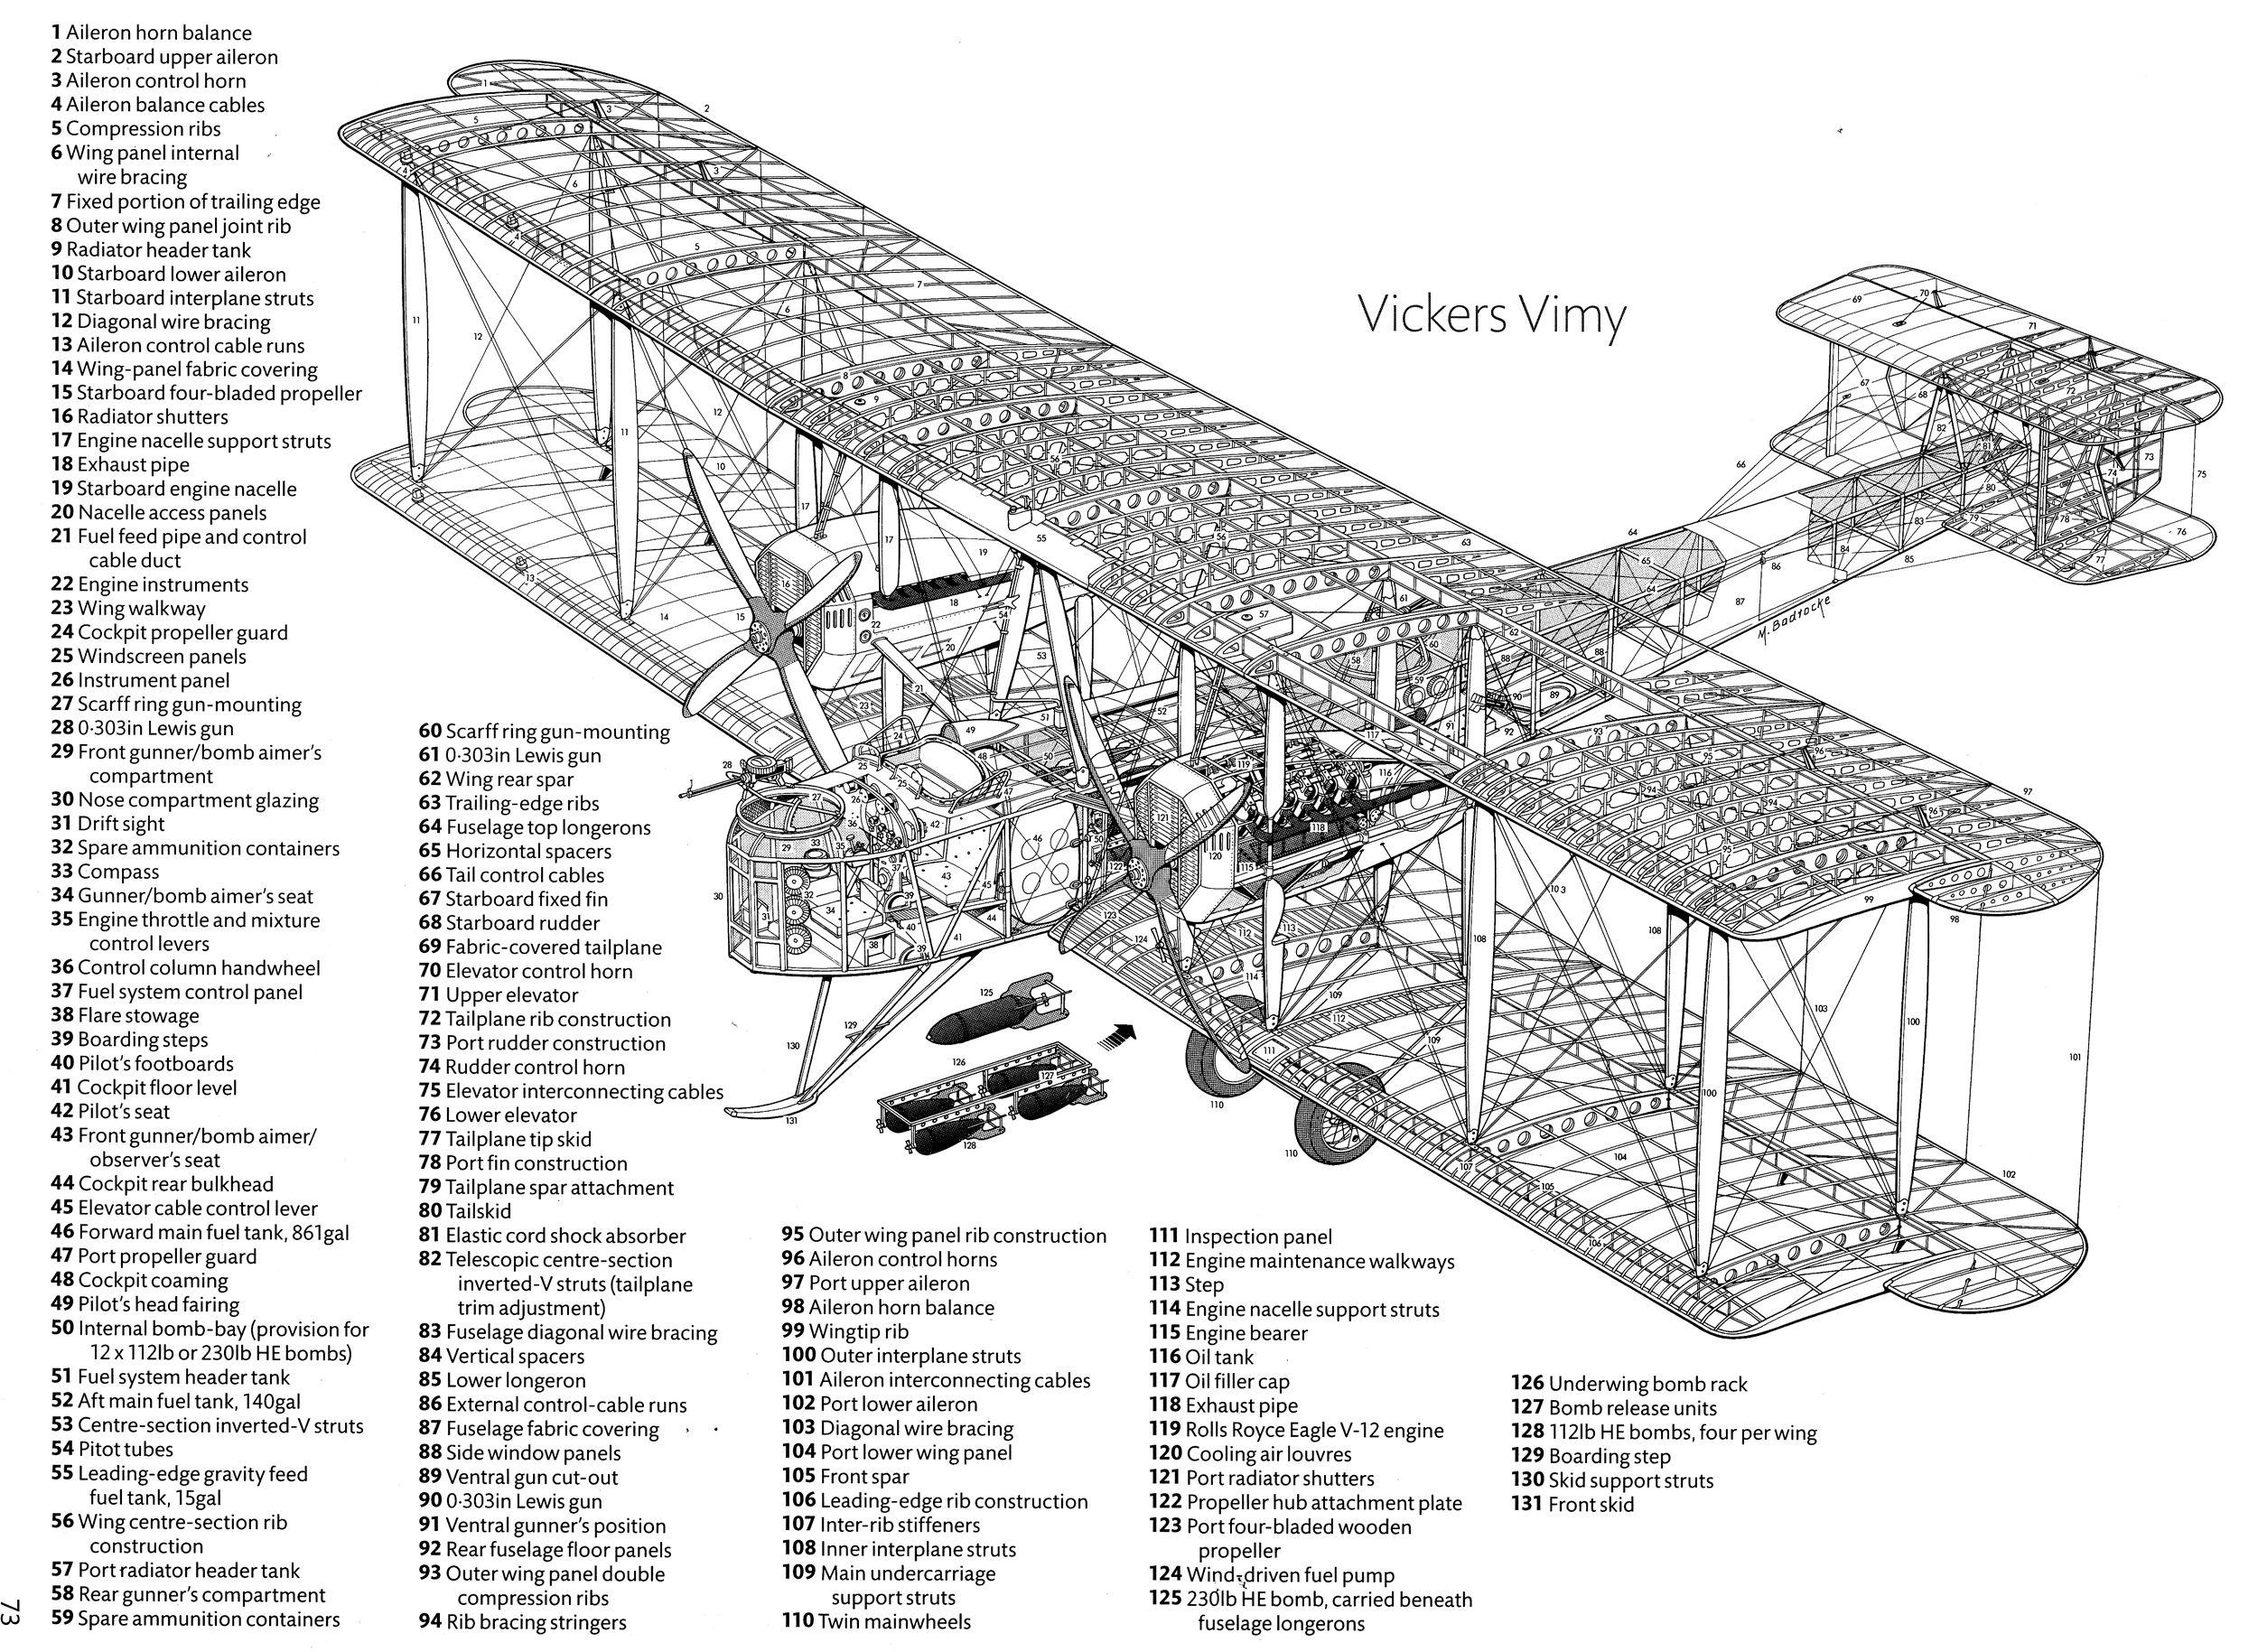 Vickers Vimy Cutaway